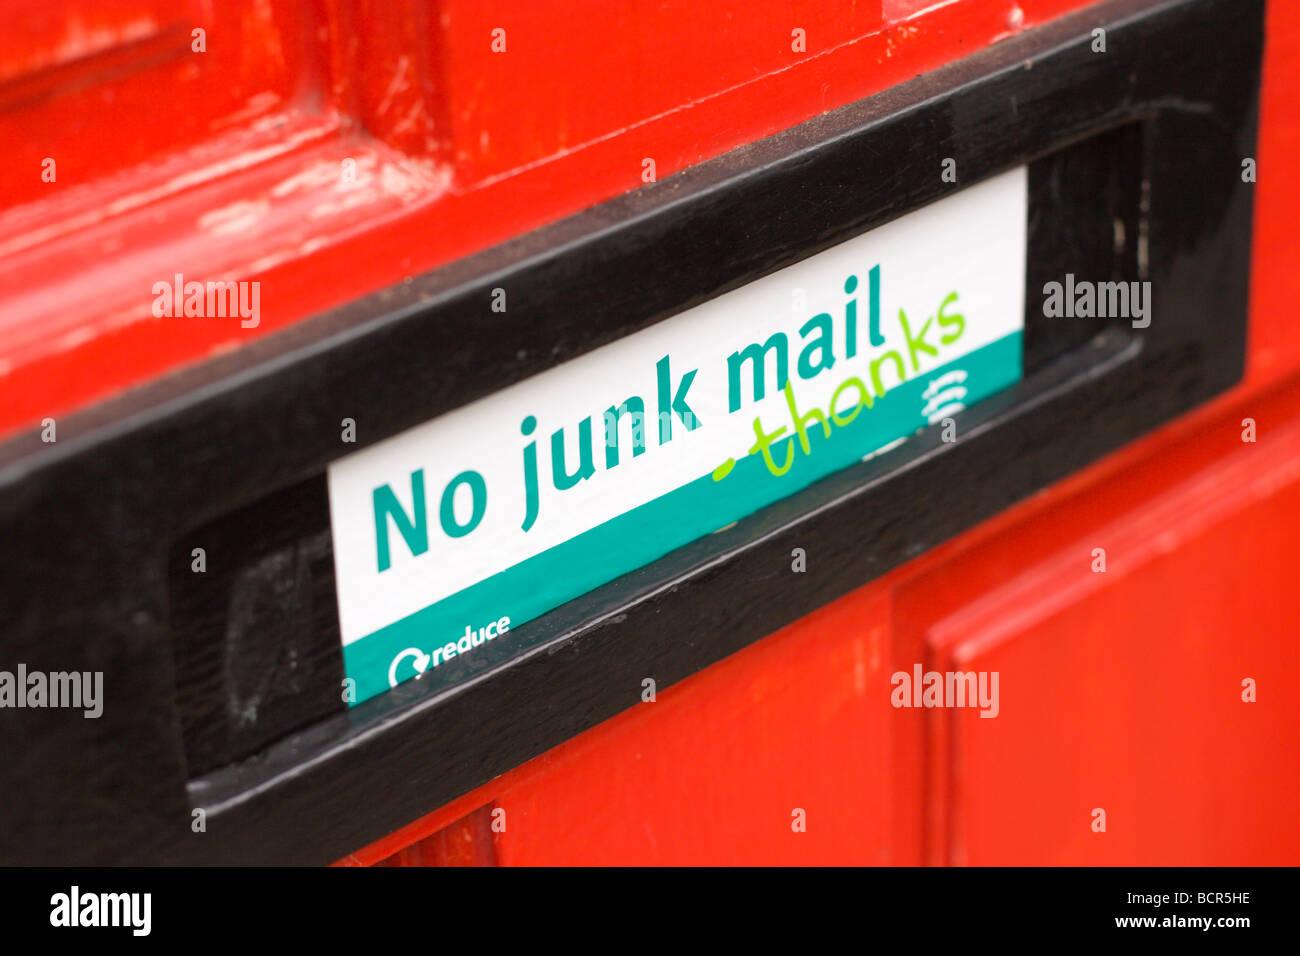 No junk mail sticke - Stock Image